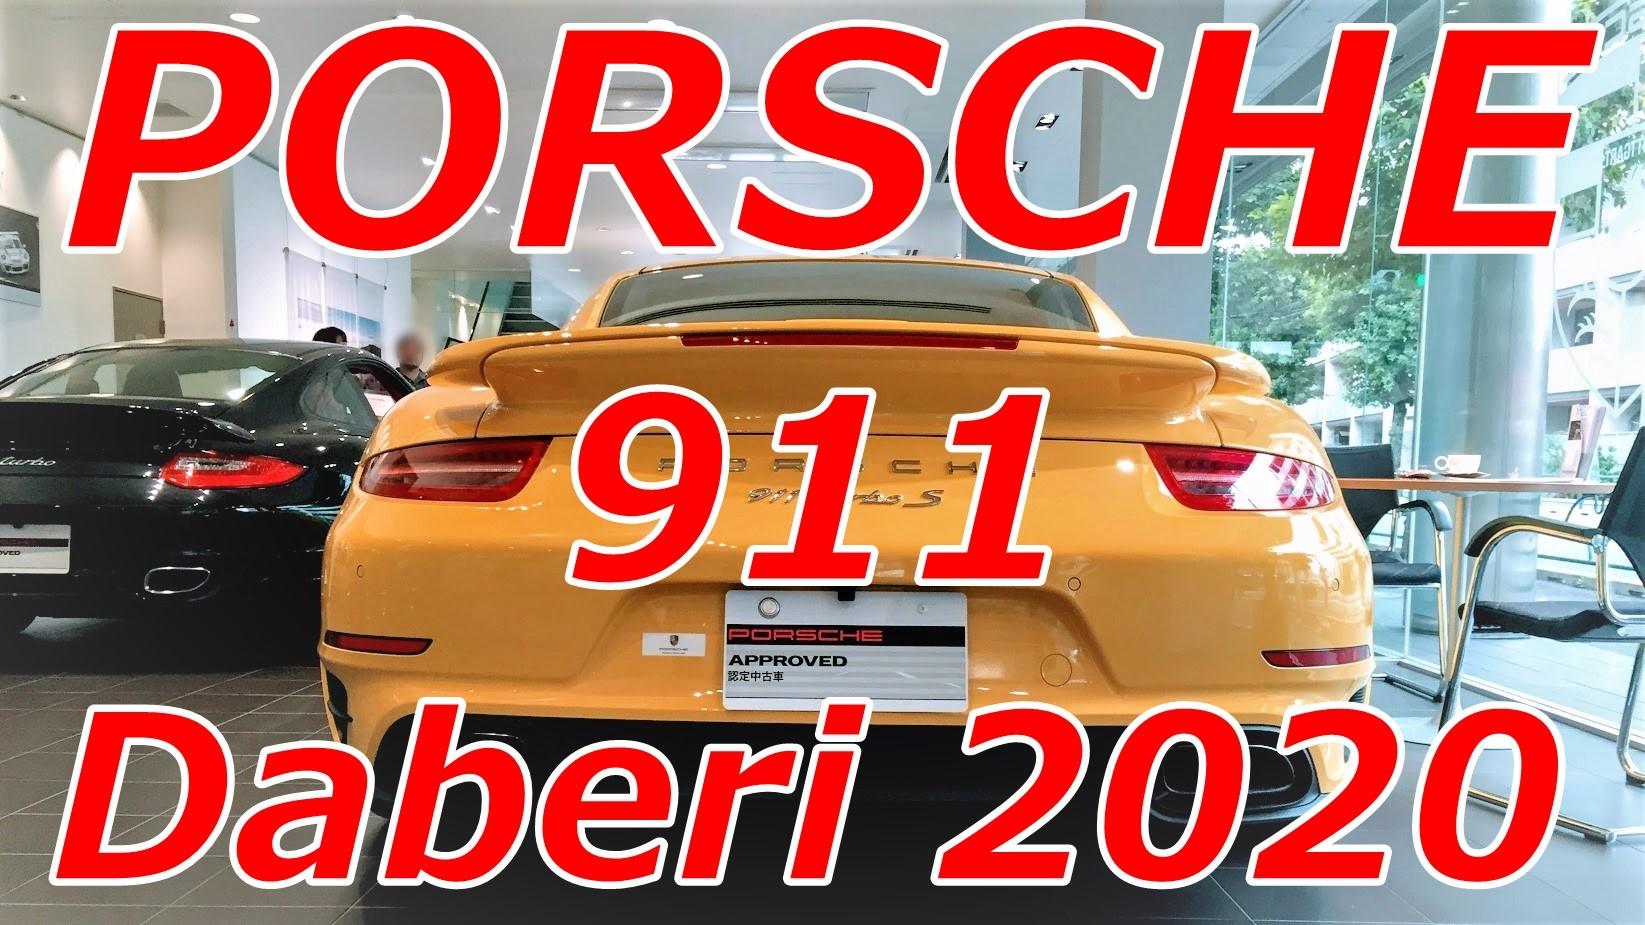 【Porsche】ポルシェ911中古車価格だべり2020